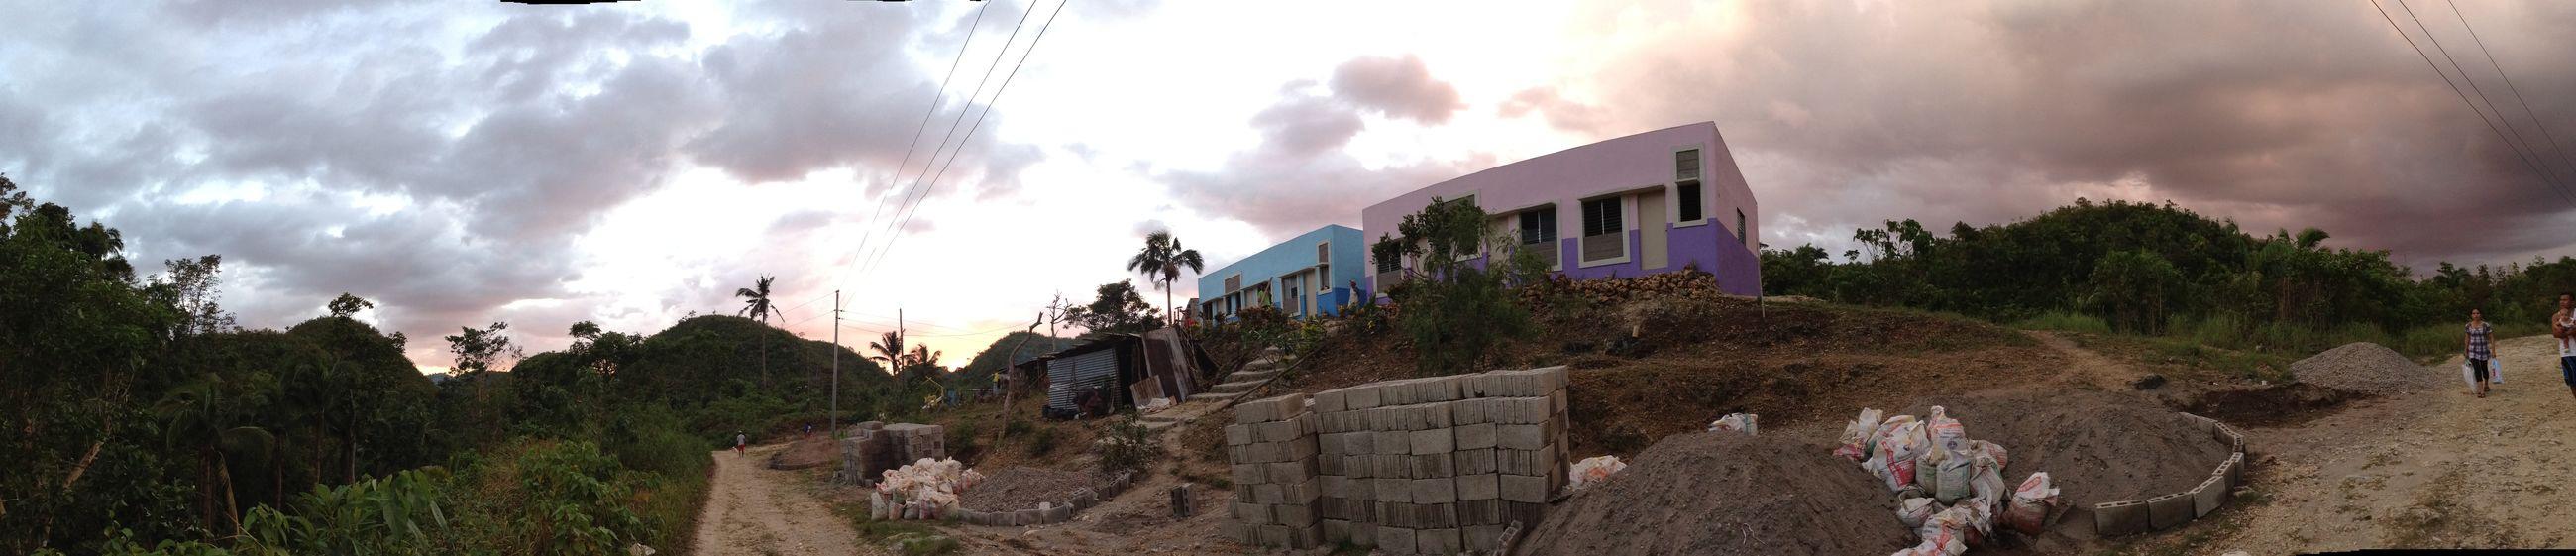 Home building Volunteering Gawadkalinga Home Building Advocacy